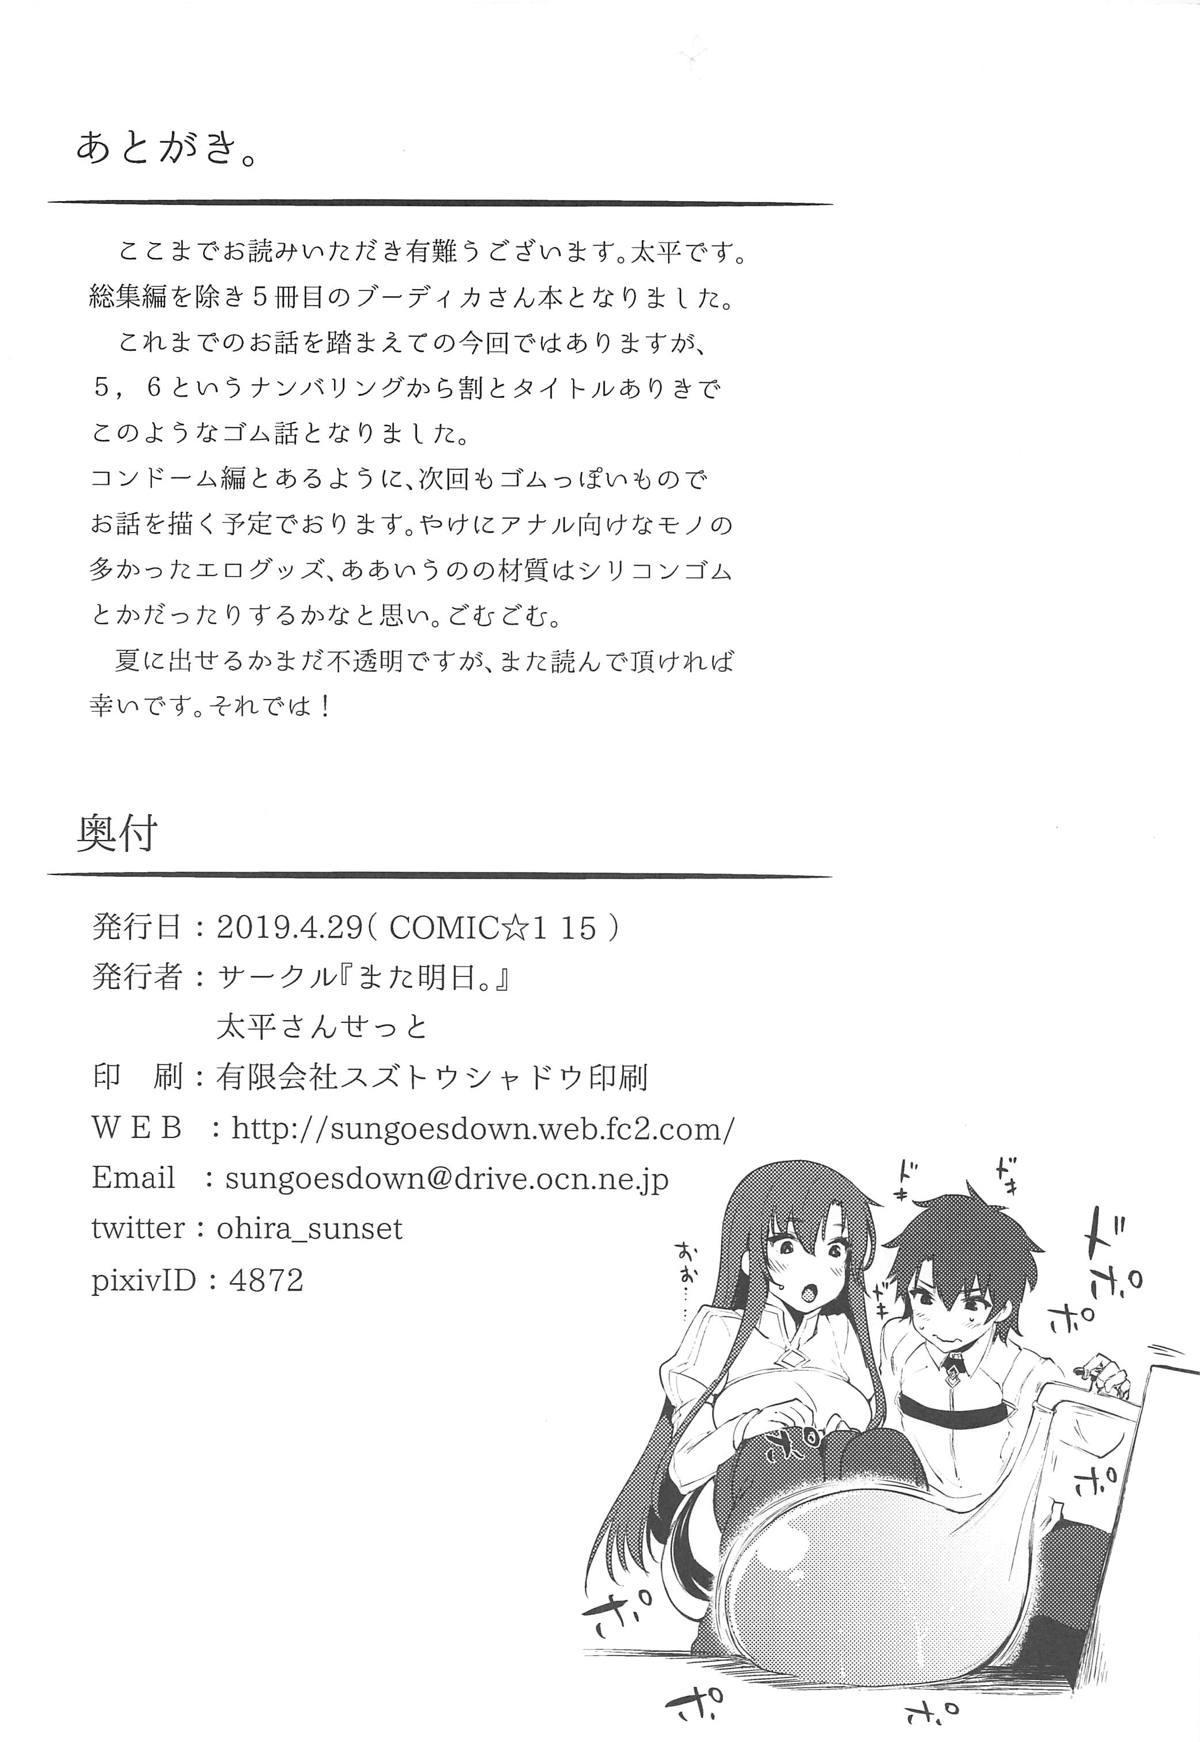 (COMIC1☆15) [Mata Ashita. (Oohira Sunset)] Boudica-san to Gom. -Condom Hen- (Fate/Grand Order) 20